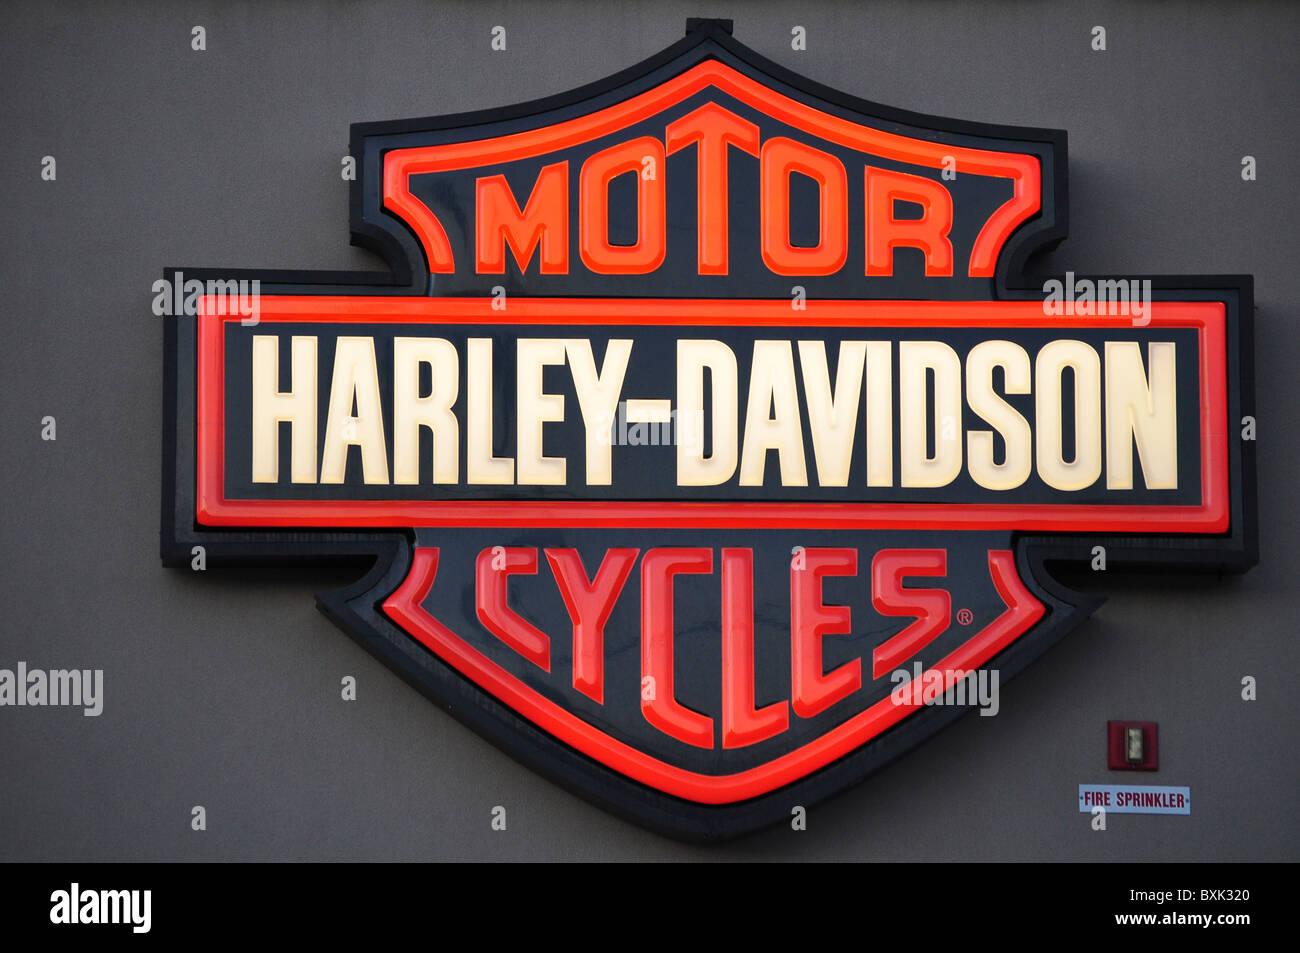 Harley Davidson Motor Cycles Stock Photos Harley Davidson Motor